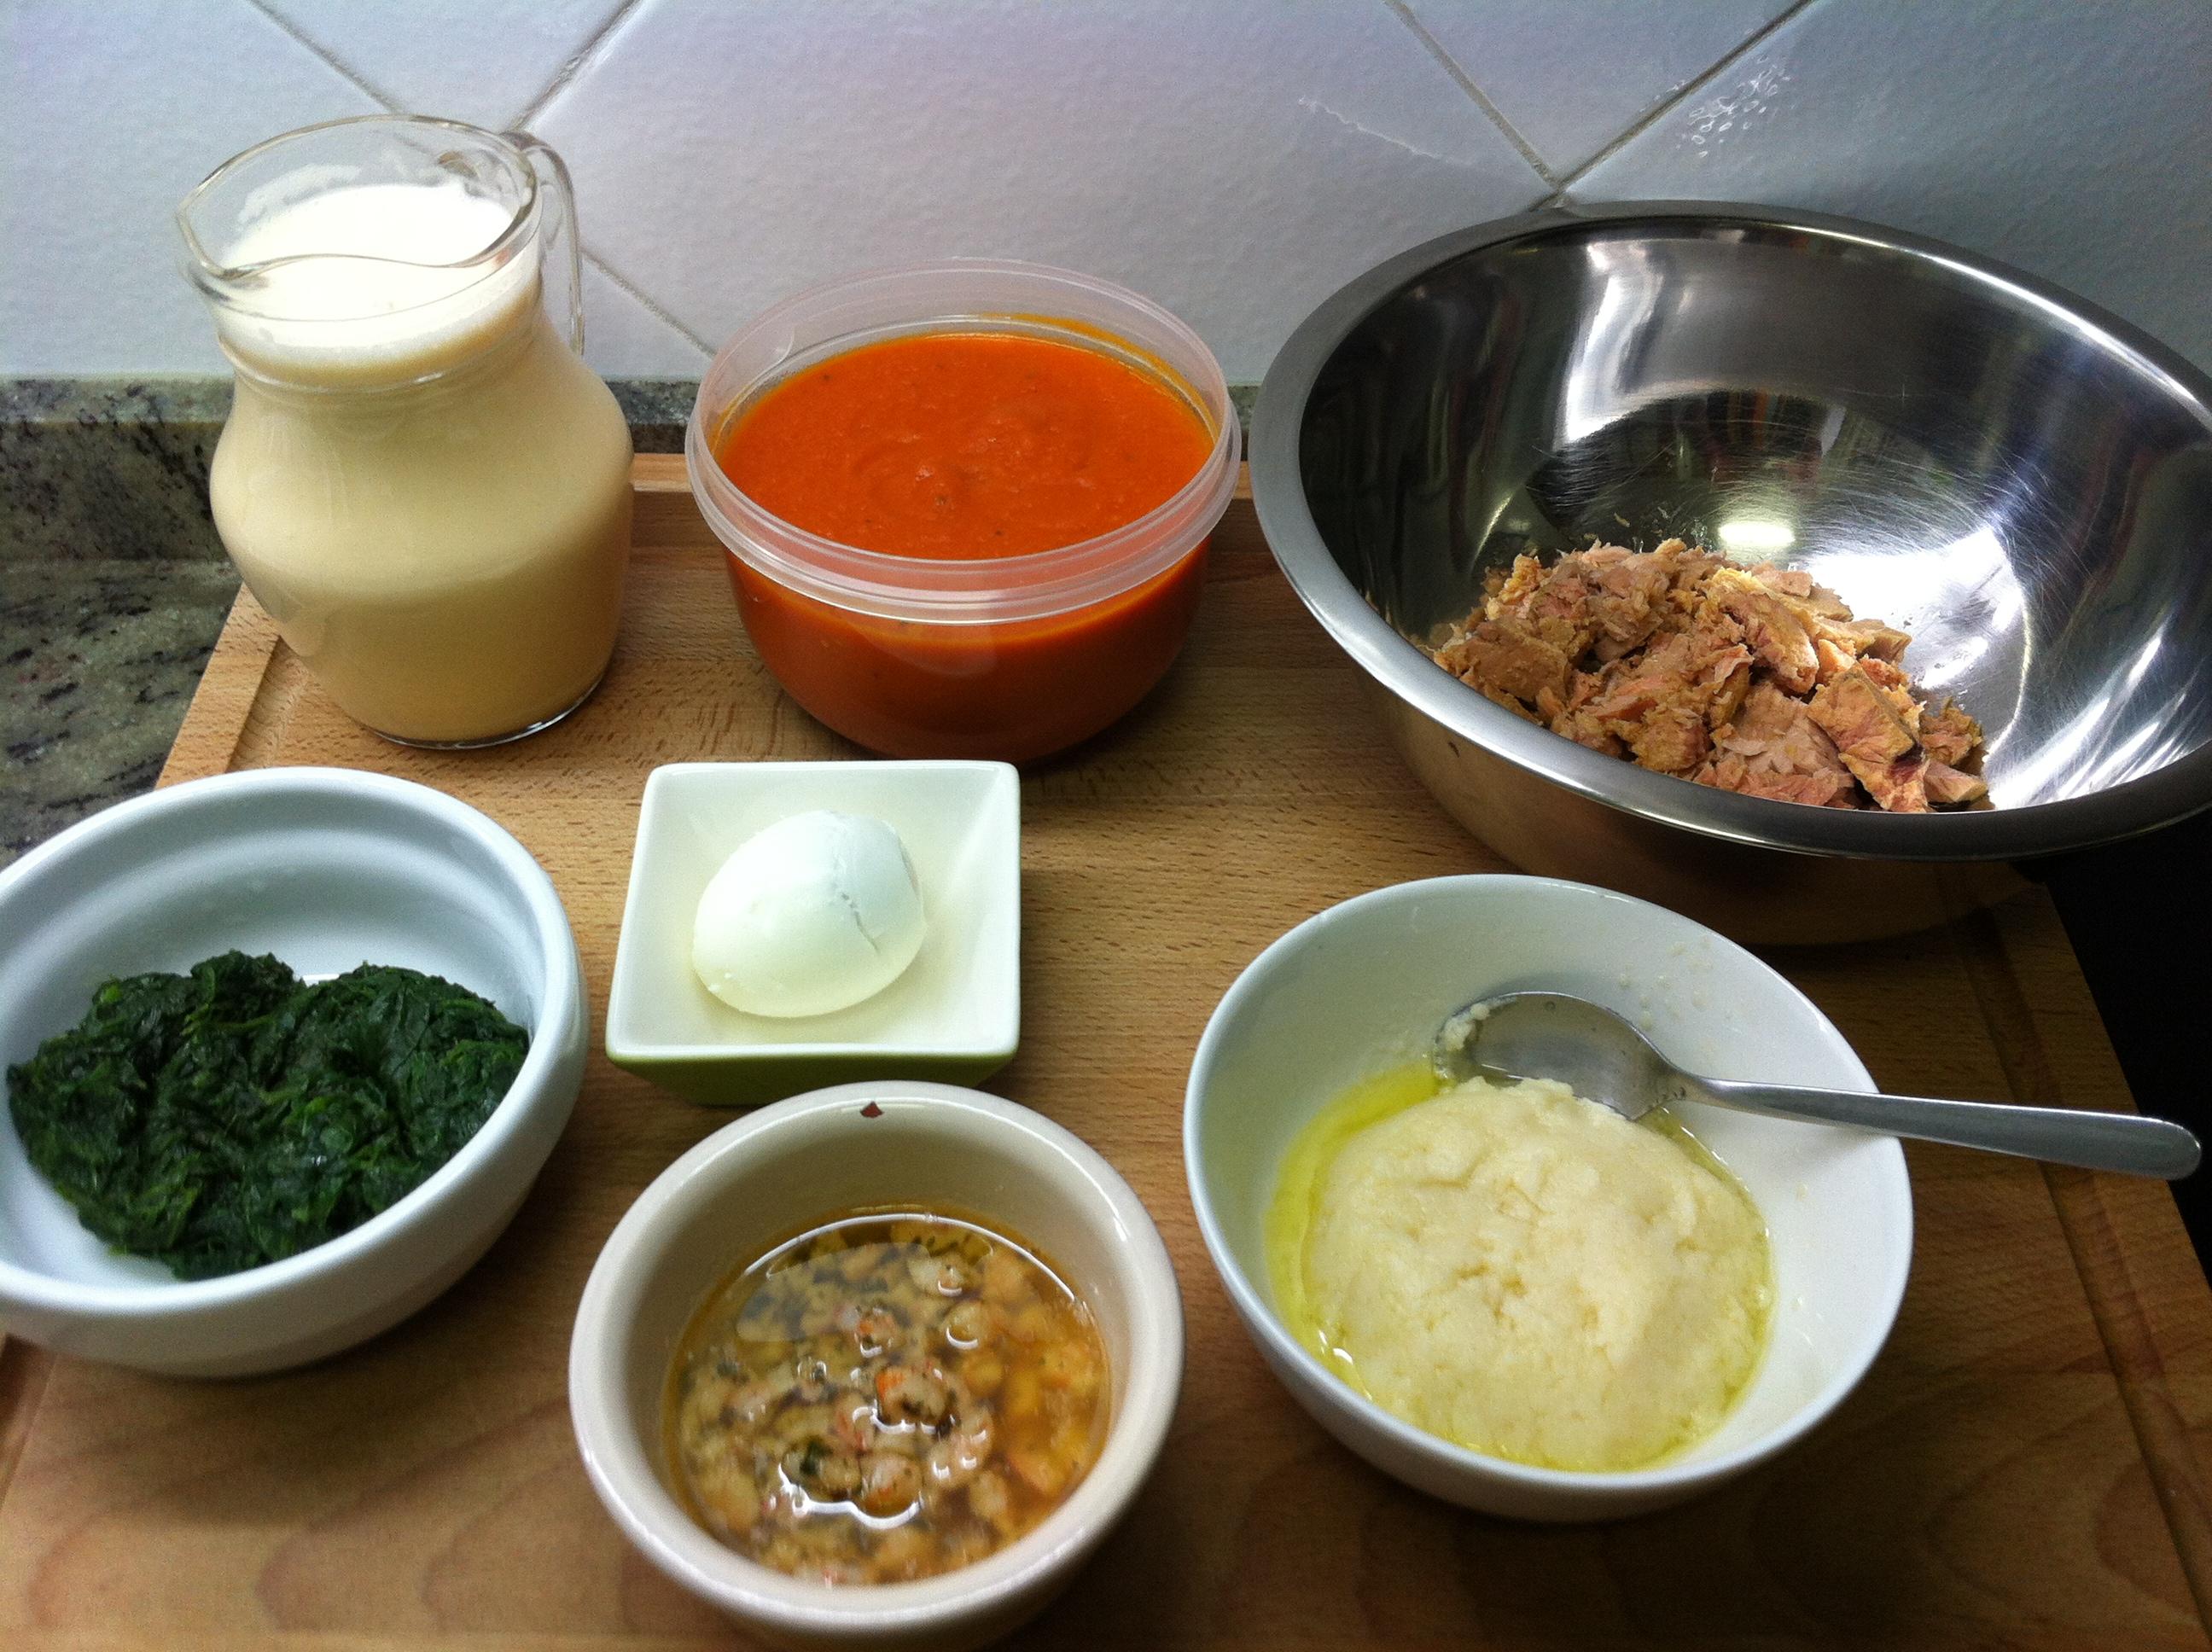 recetas caseras espinacas